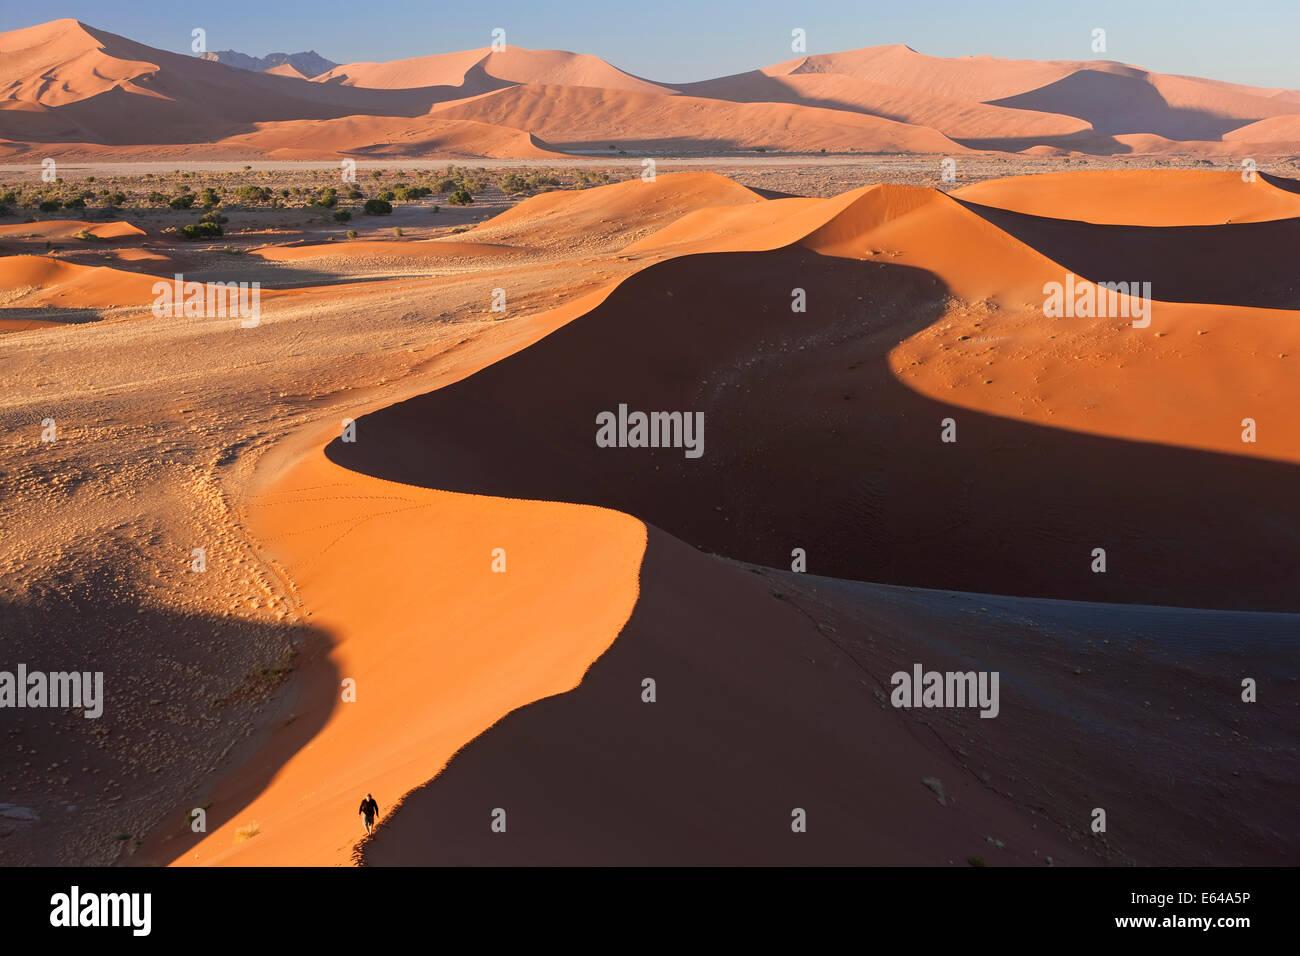 Hombre subiendo dunas de arena, el Parque Nacional Namib Naukluft, Namibia Imagen De Stock